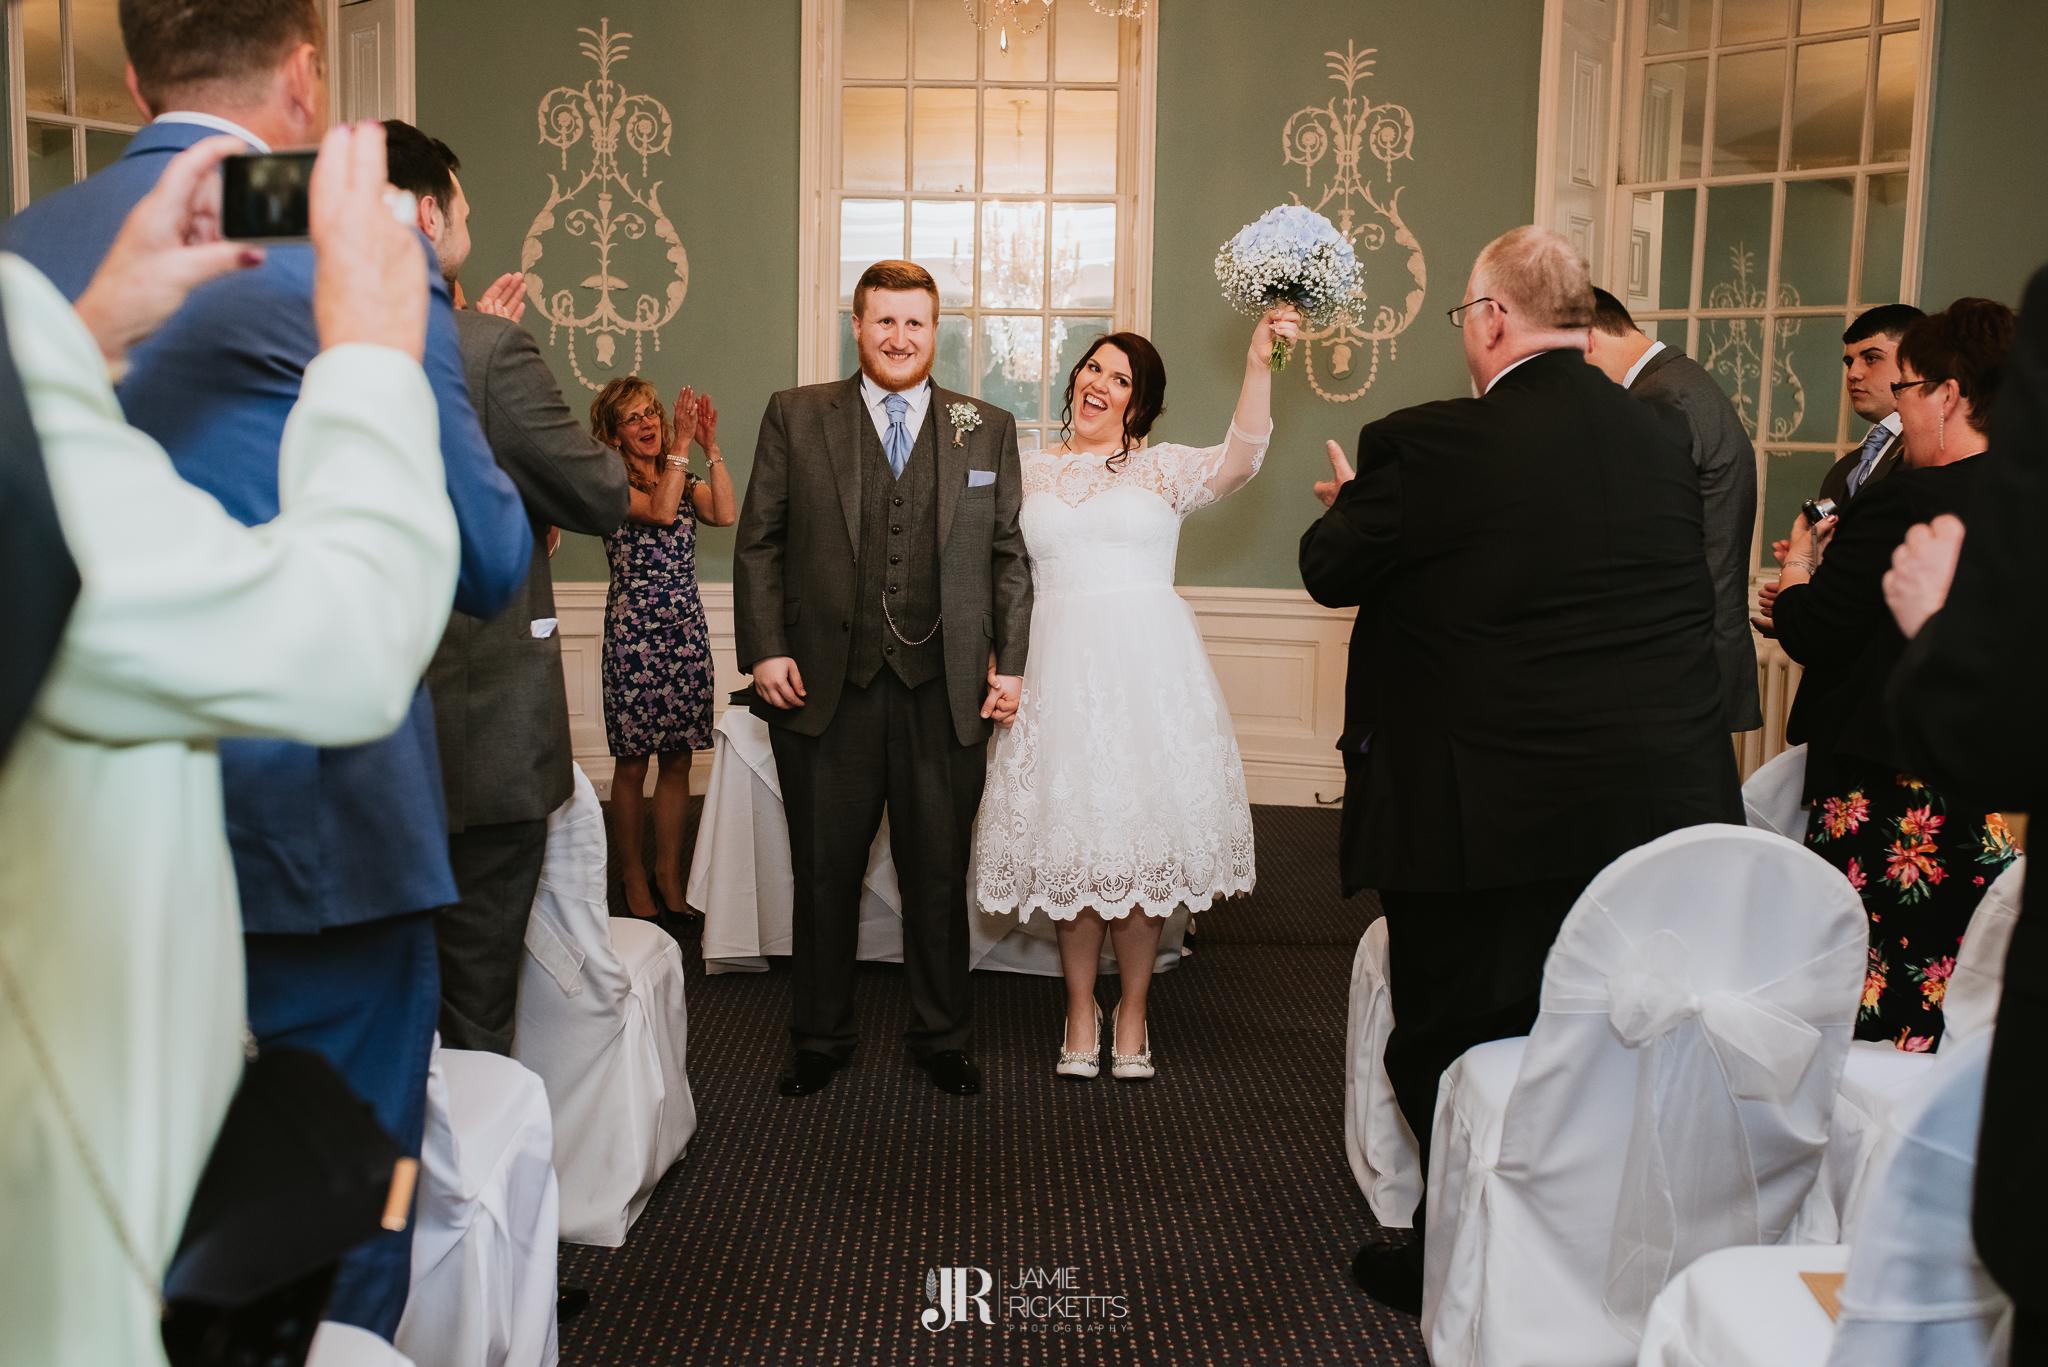 Wedding-Photographer-Shropshire-11.JPG